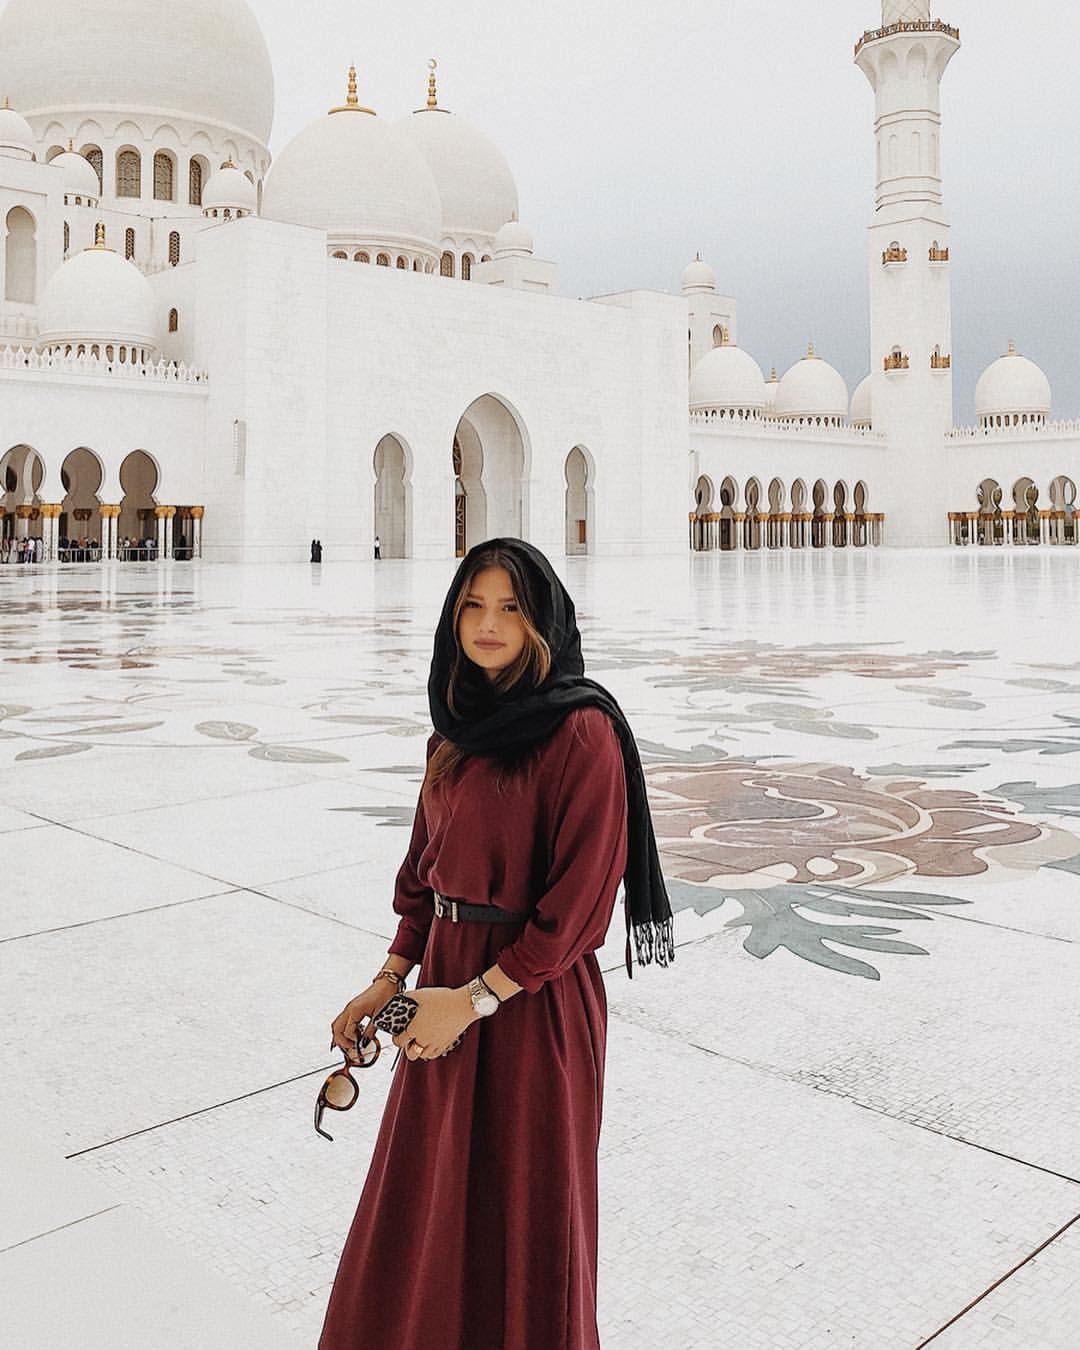 Zoe Coopman Op Instagram Sheikh Zayed Grand Mosque Abu Dhabi